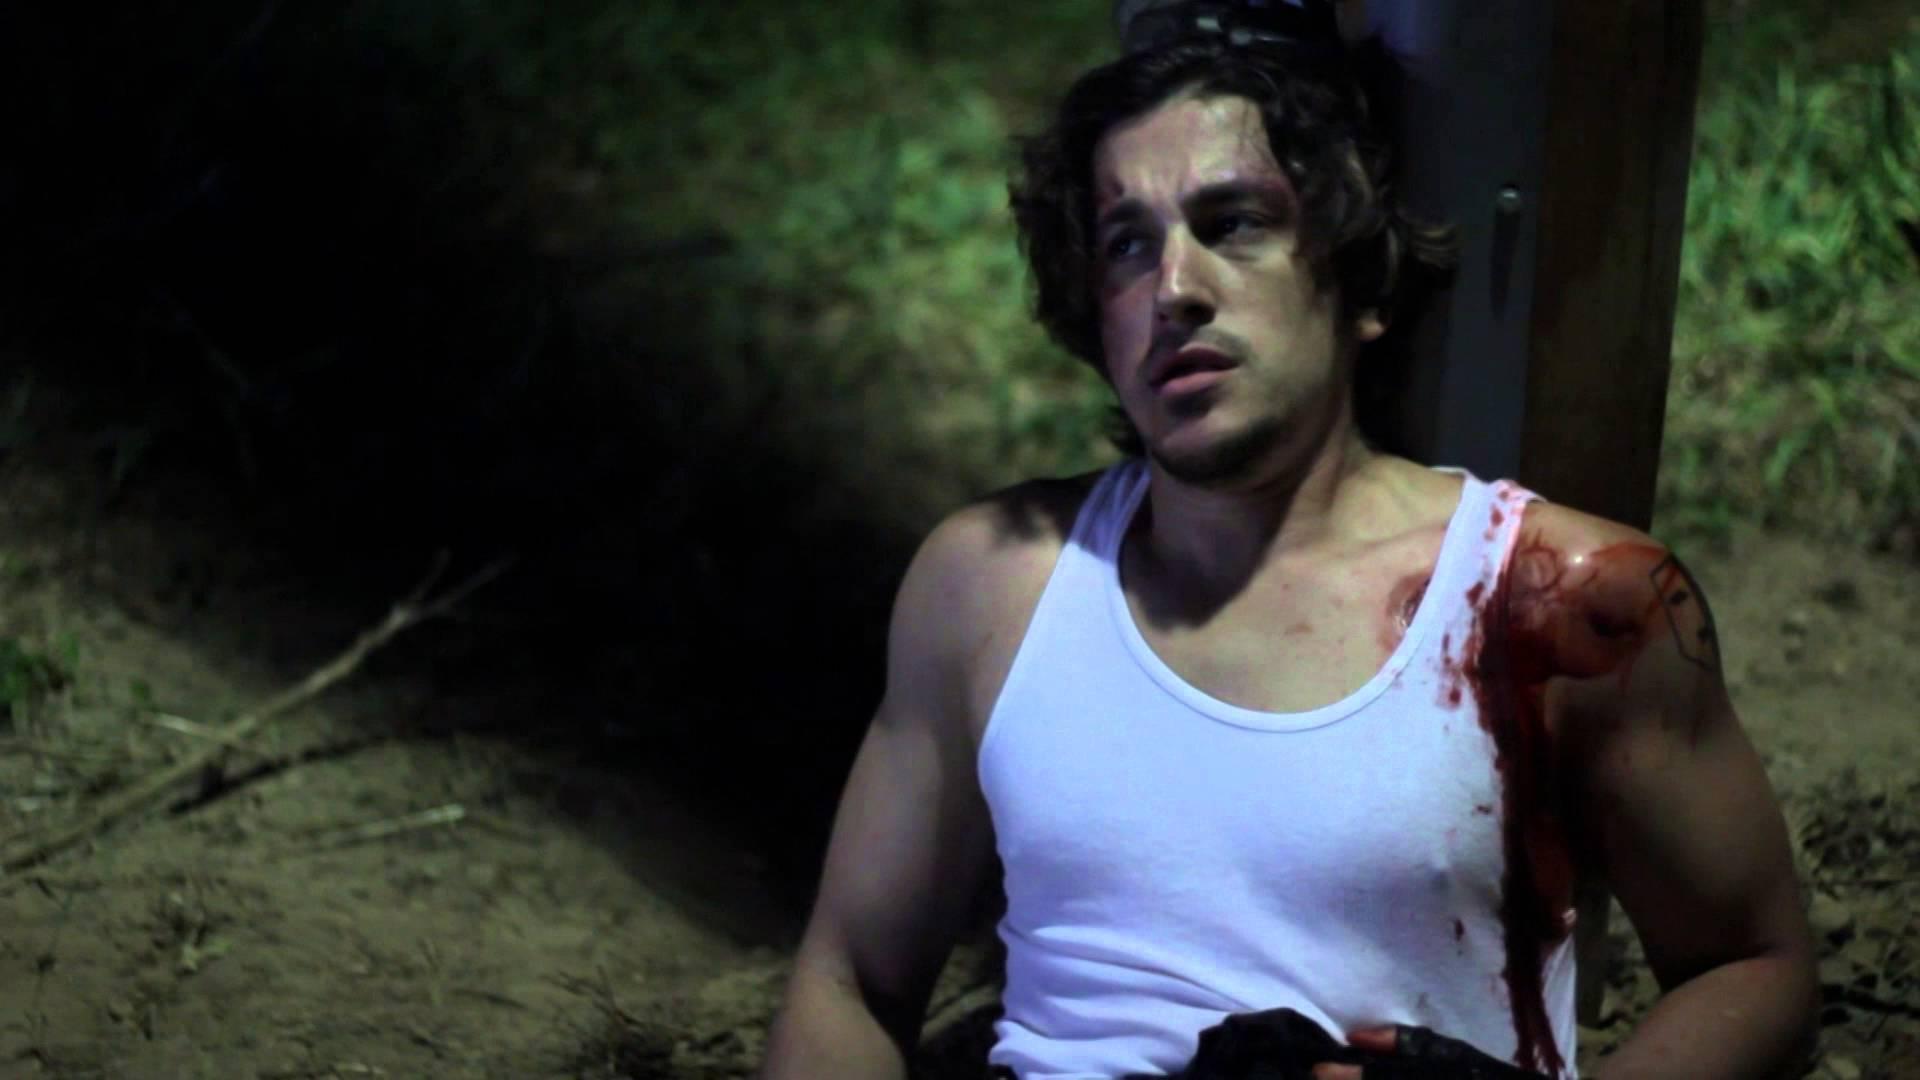 Stephen Anthony Grey - The Spirit of Mumbai (2014) Clip